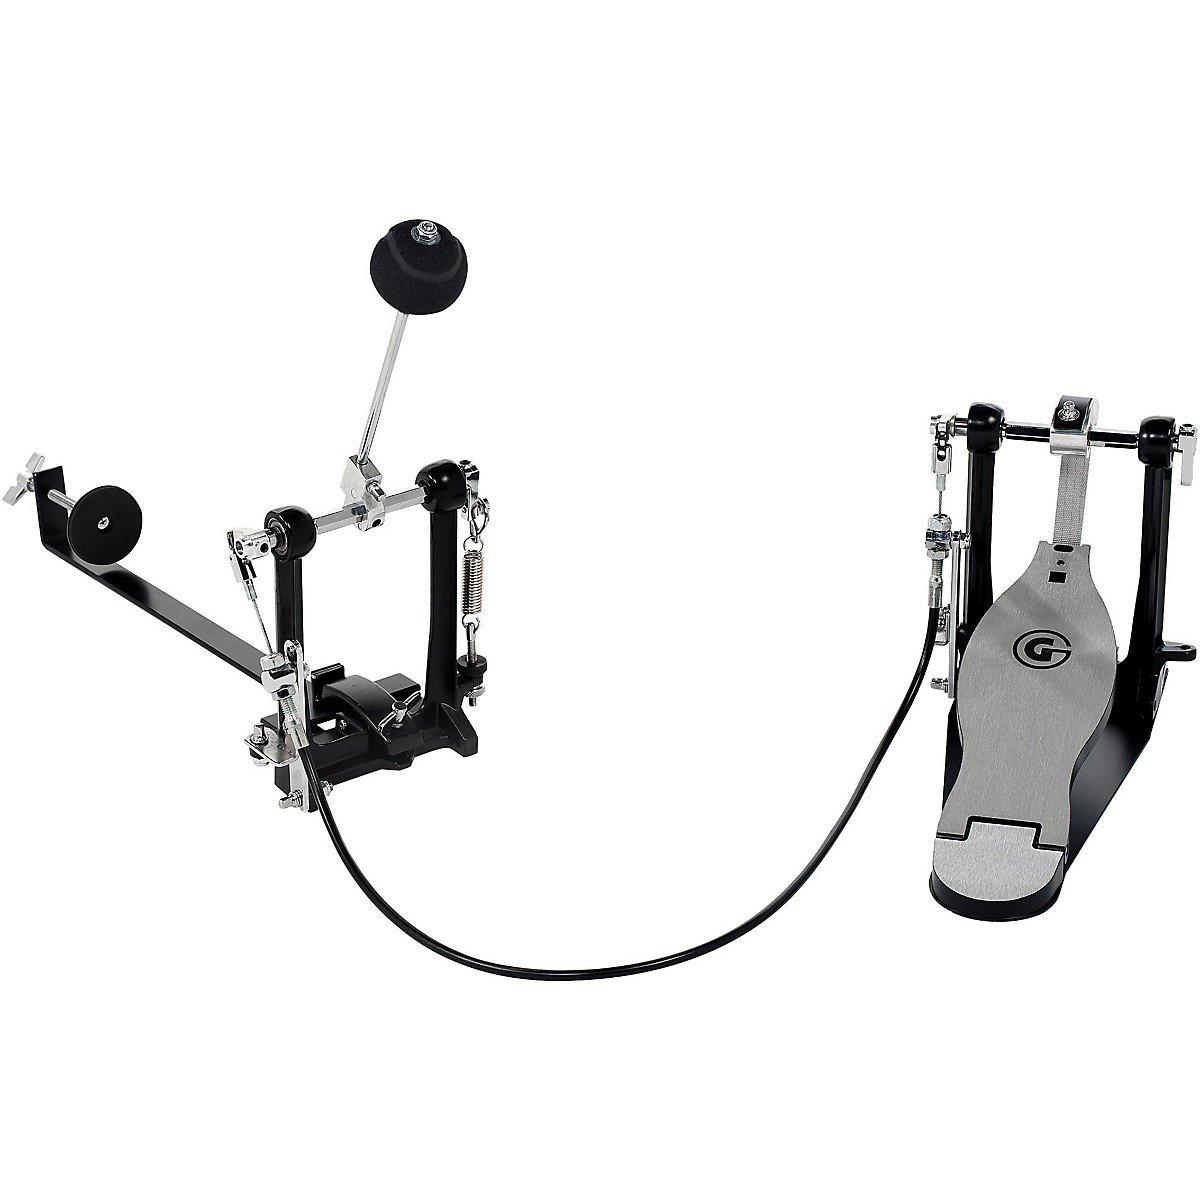 gibraltar g3gcp strap drive cajon pedal drums on sale. Black Bedroom Furniture Sets. Home Design Ideas